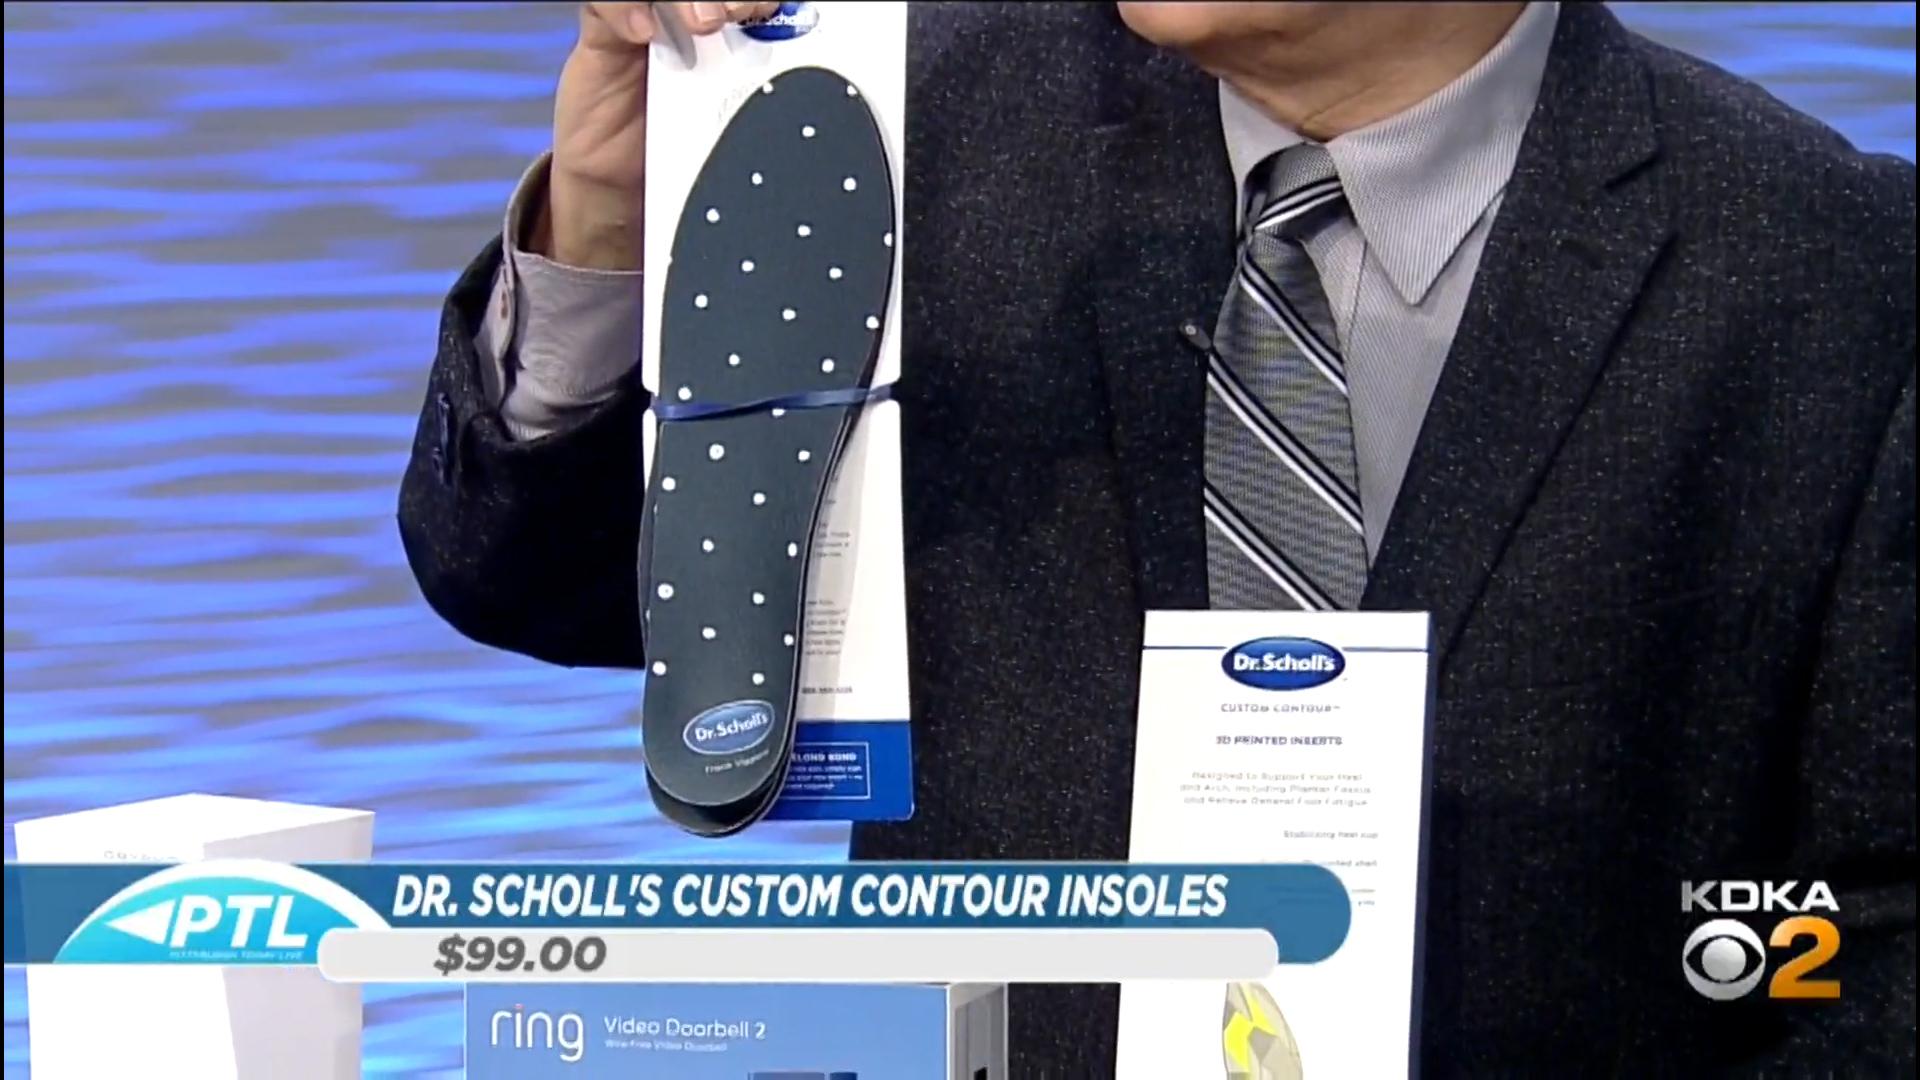 DR. SCHOLL'S CUSTOM CONTOUR PRINTED INSOLES - $99.00Shop Now